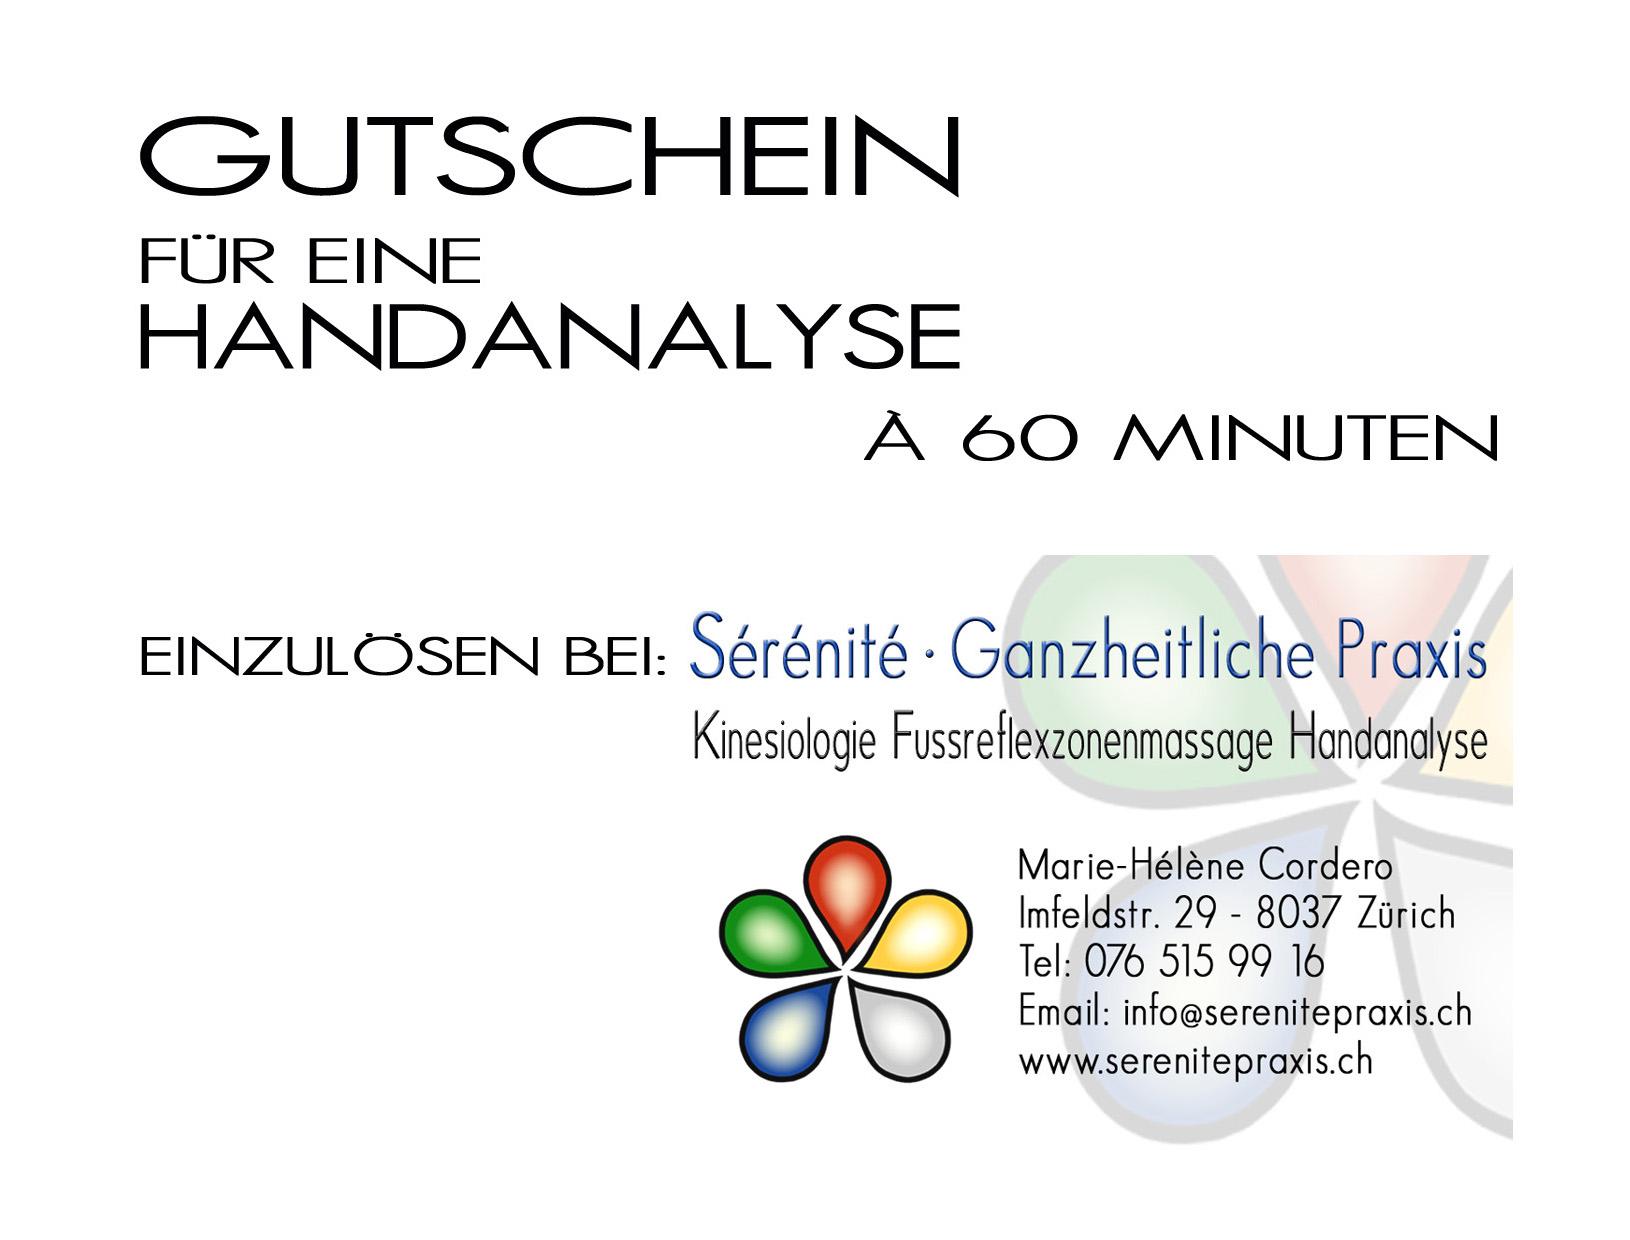 Handanalyse Gutschein 60Min. Sérénité Praxis Zürich